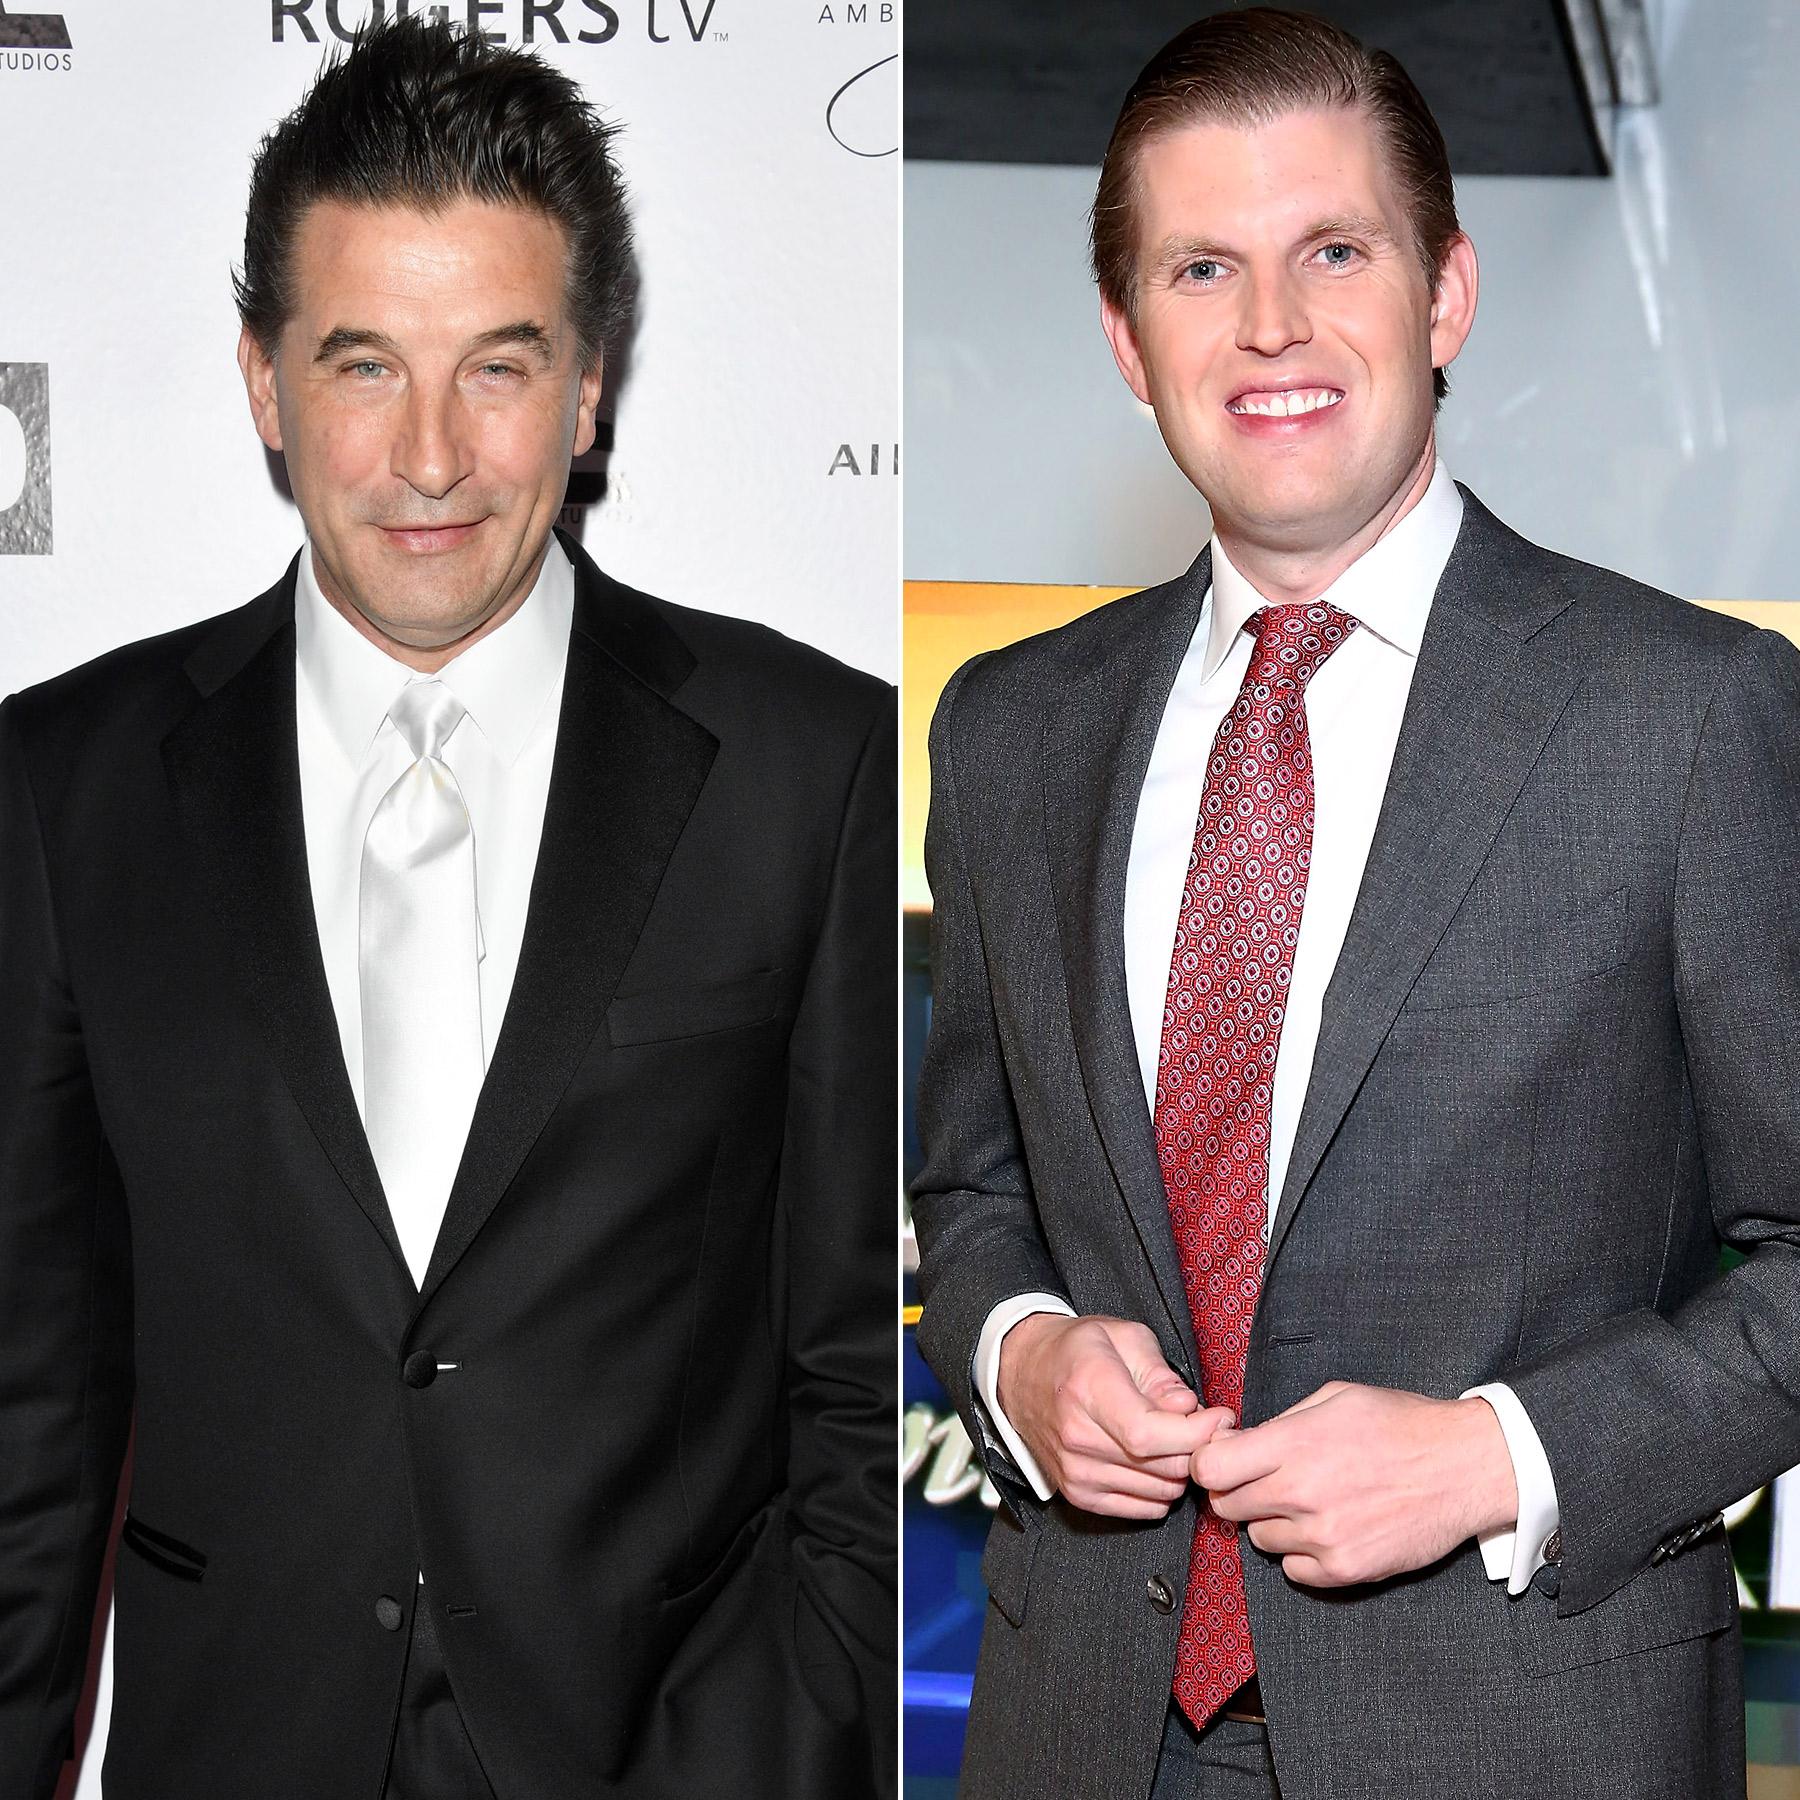 Billy Baldwin will play Eric Trump on SNL